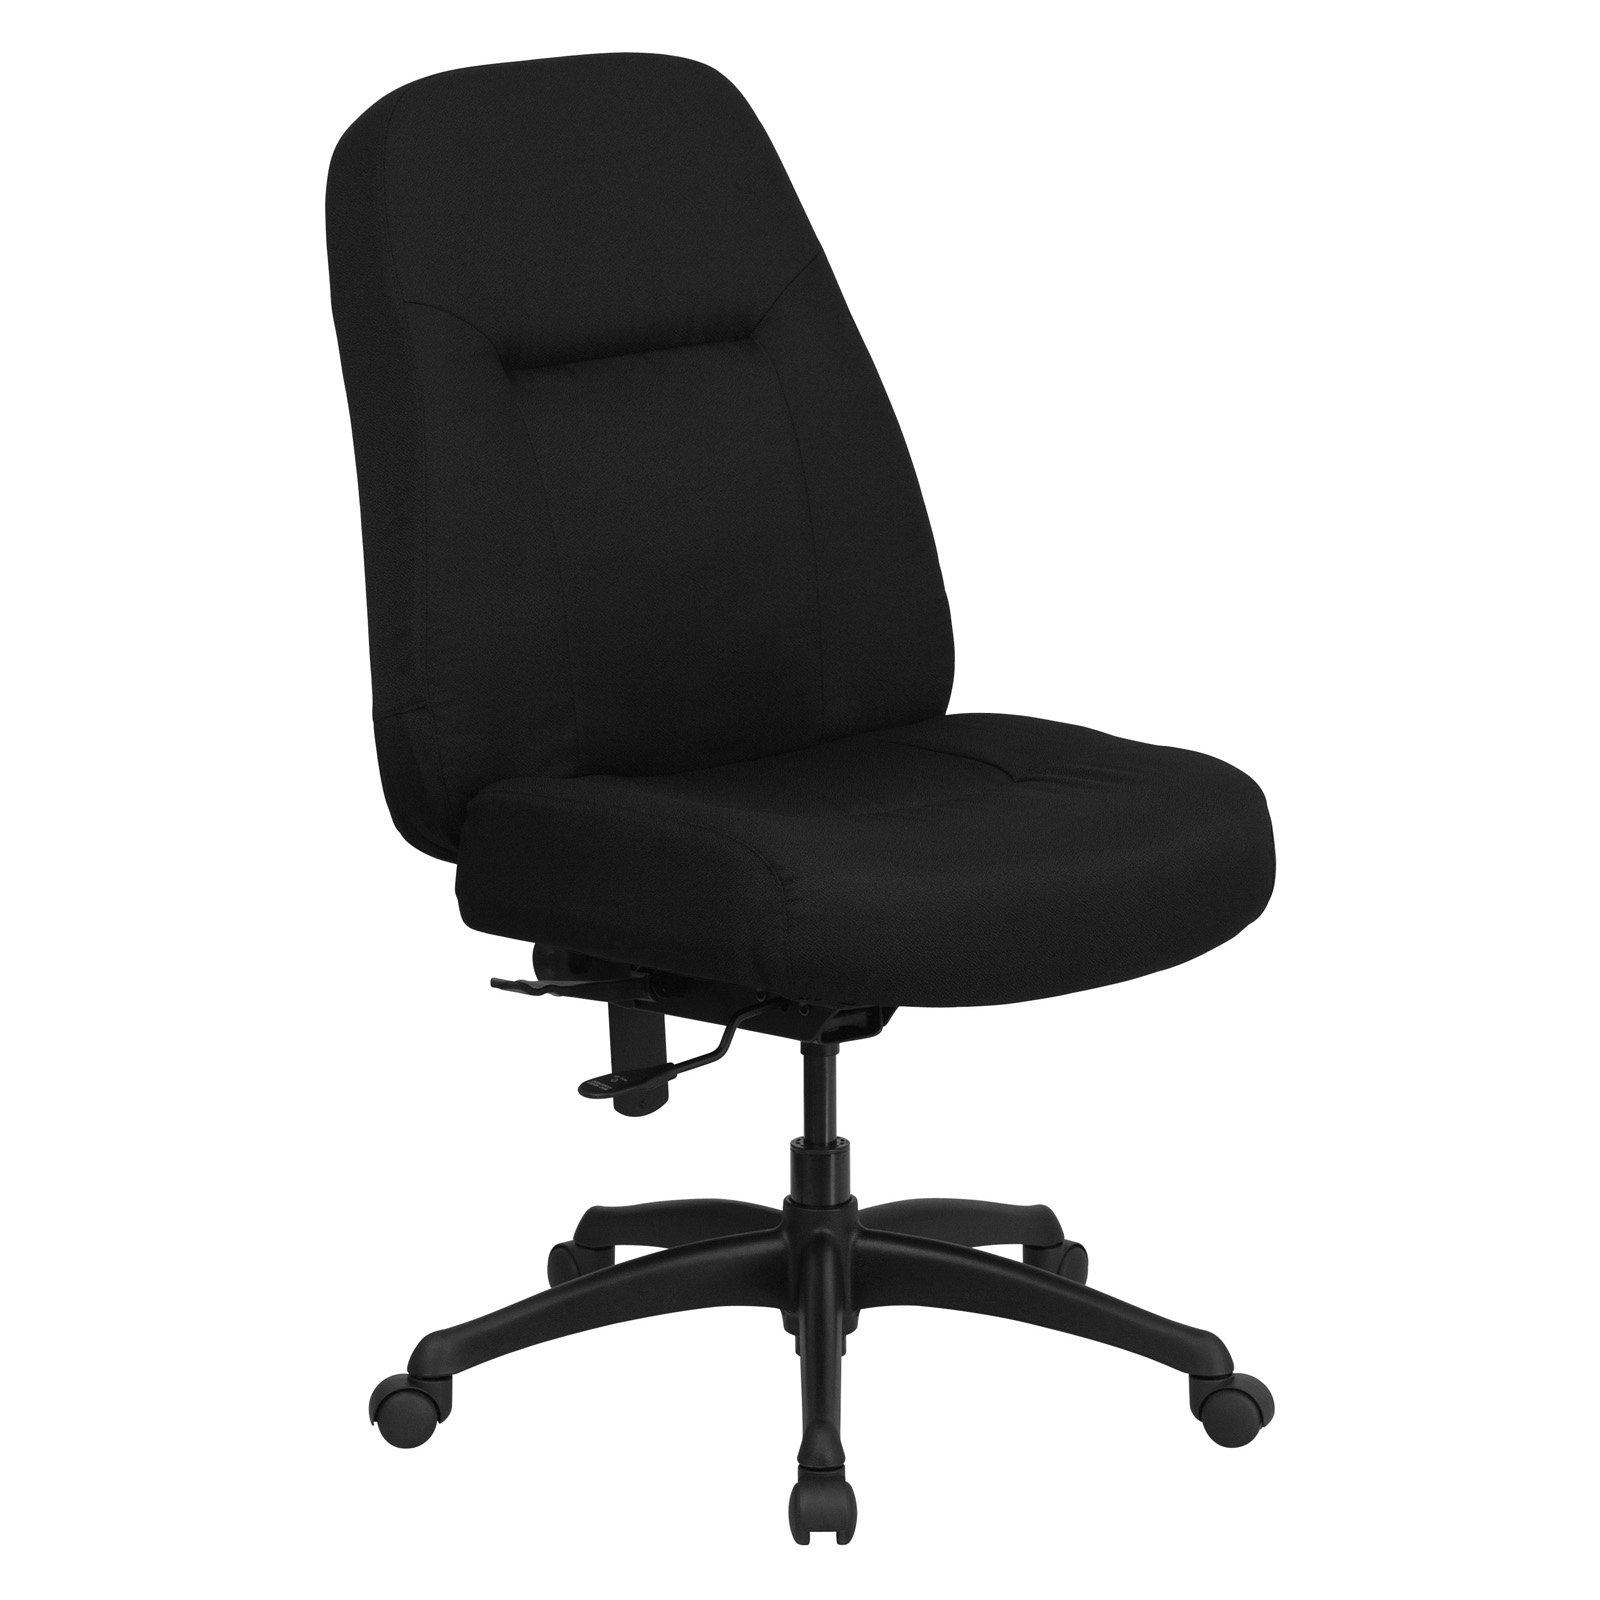 xl desk chair fruitwood folding chairs big tall office flash furniture hercules high back black